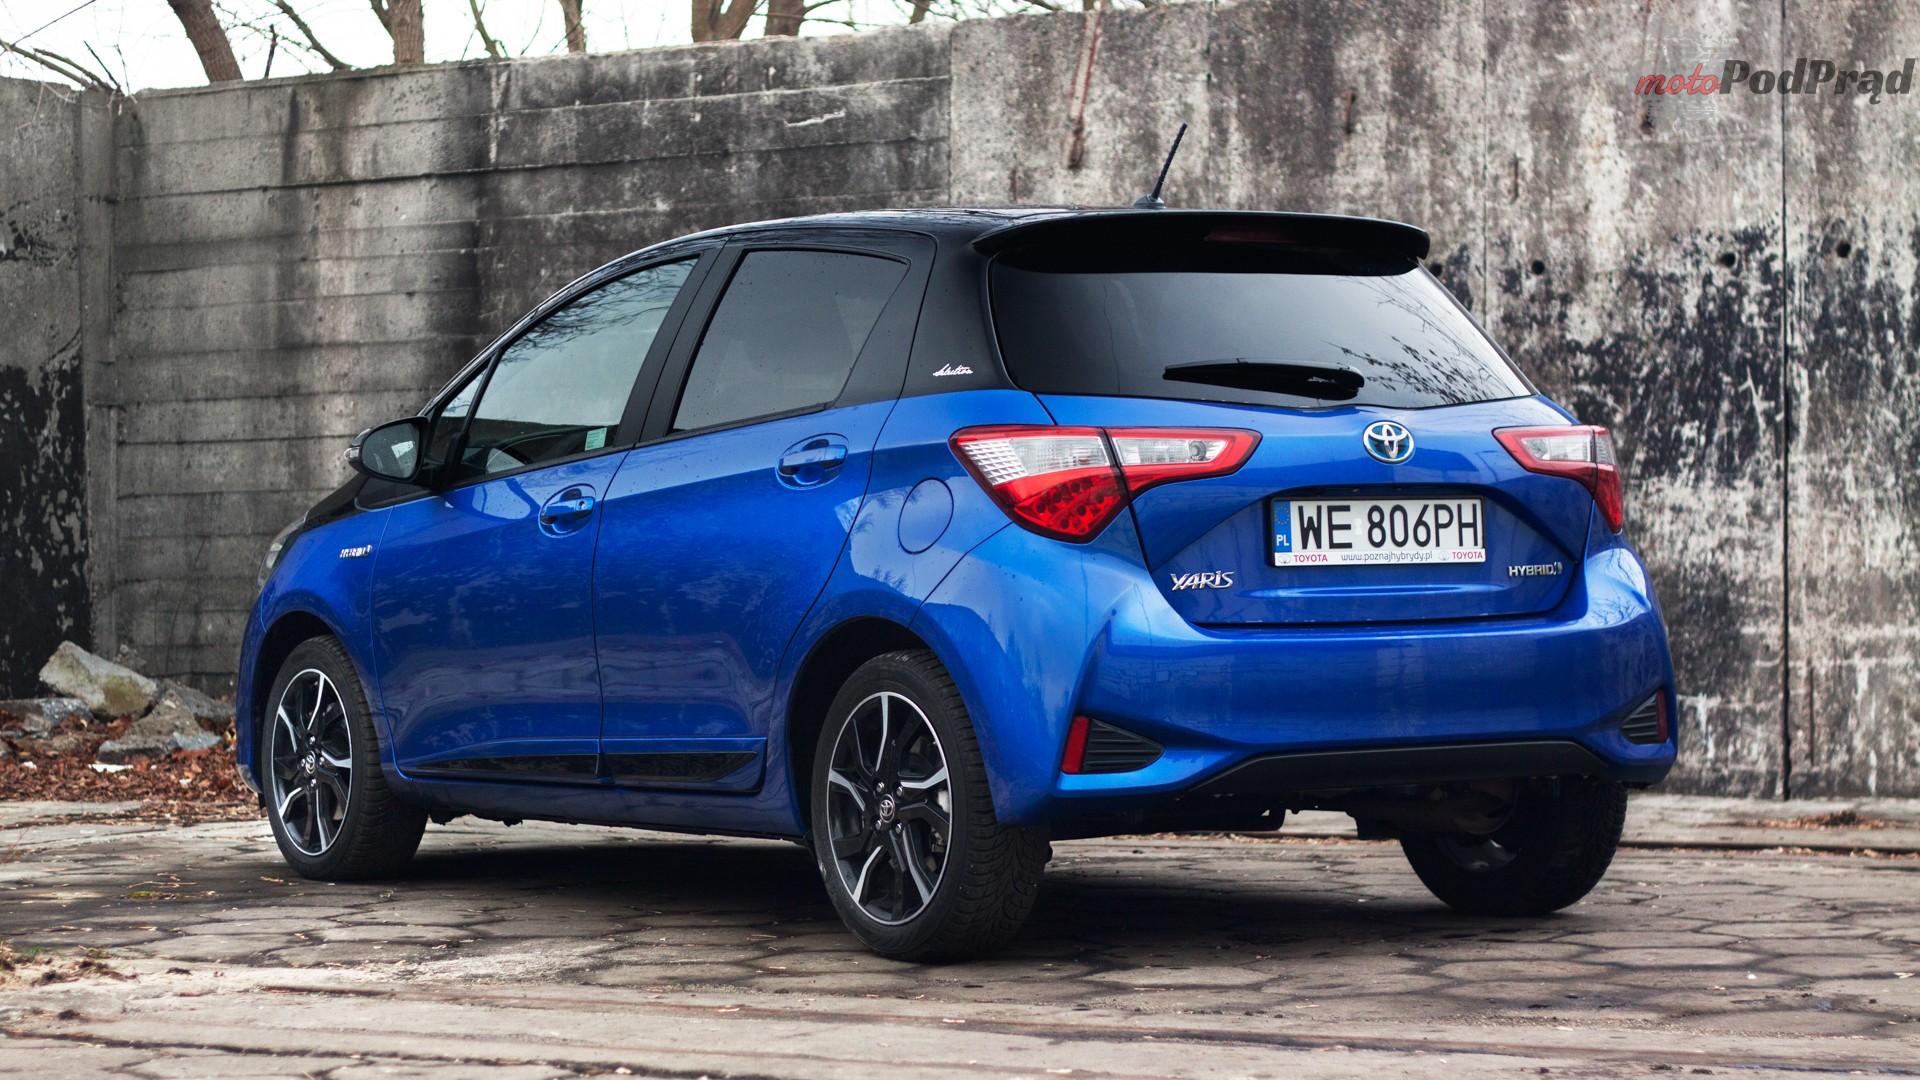 toyota yaris hybrydowa hybrid 2017 selection półprofil tył niebieska Test: Toyota Yaris Hybrid Selection   chłodna kalkulacja?